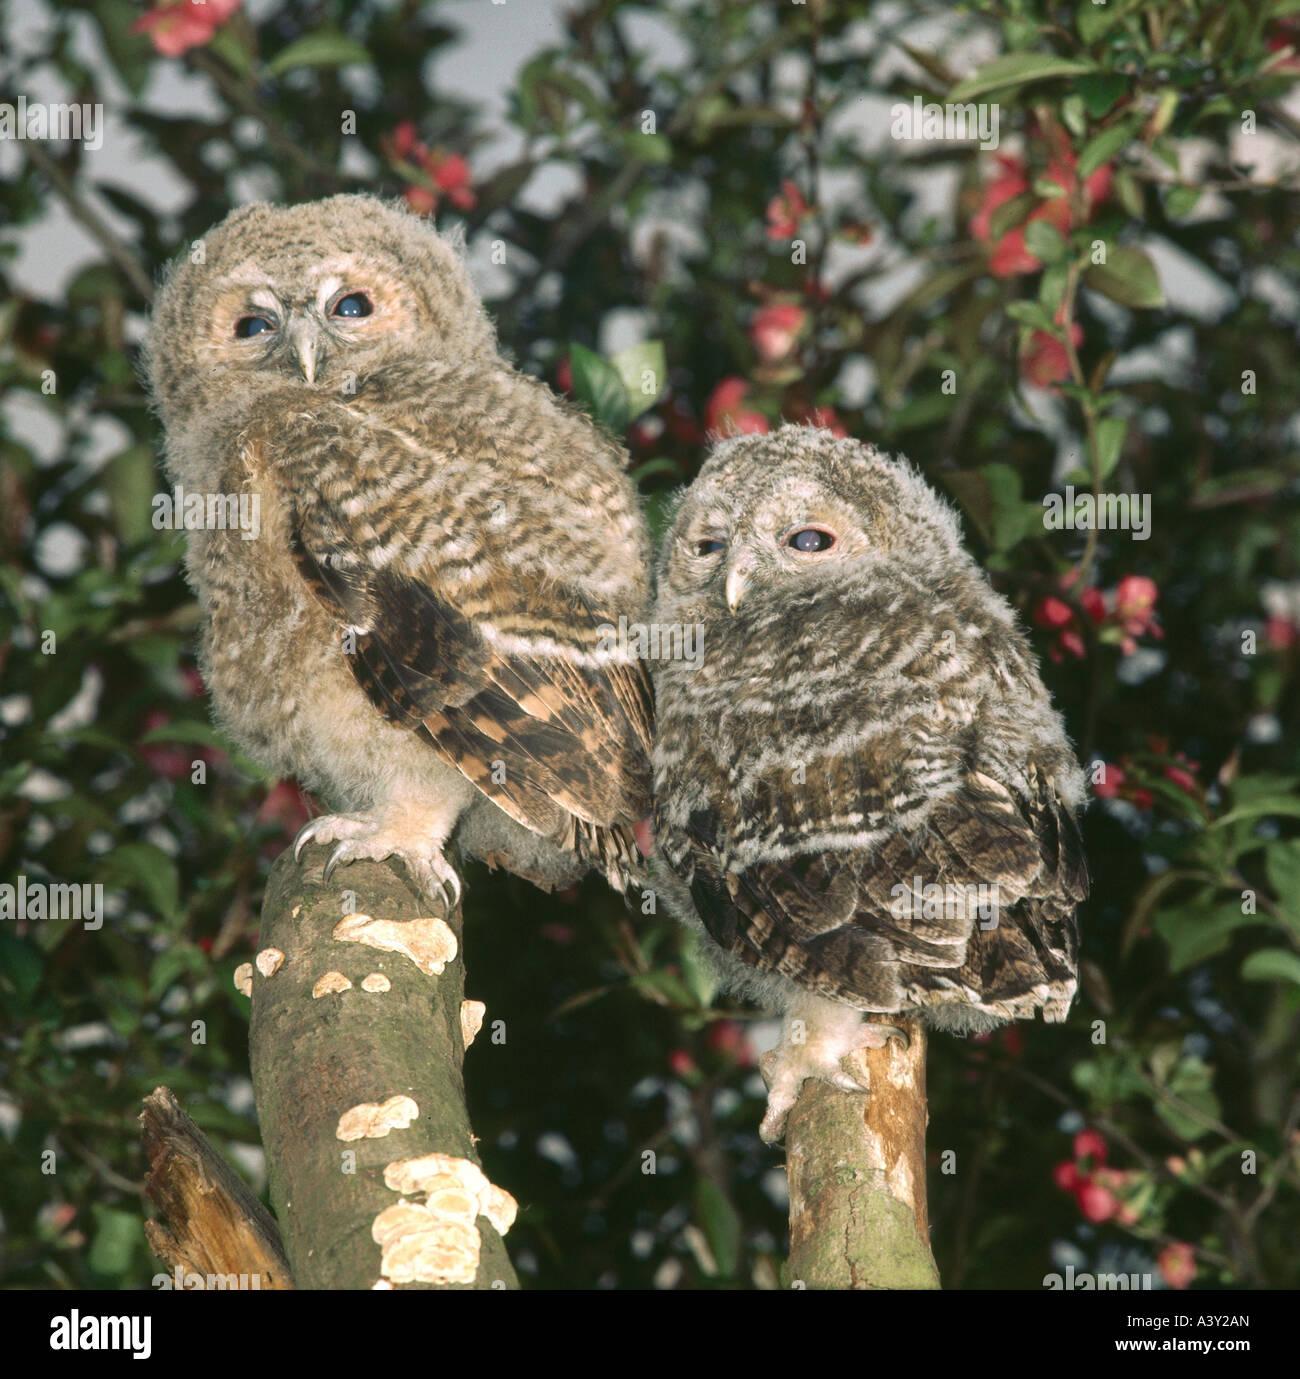 zoology / animals, avian / bird, Tawny Owl, (Strix aluco), two owls sitting on tree stumpf, frontal shot, distribution: Stock Photo